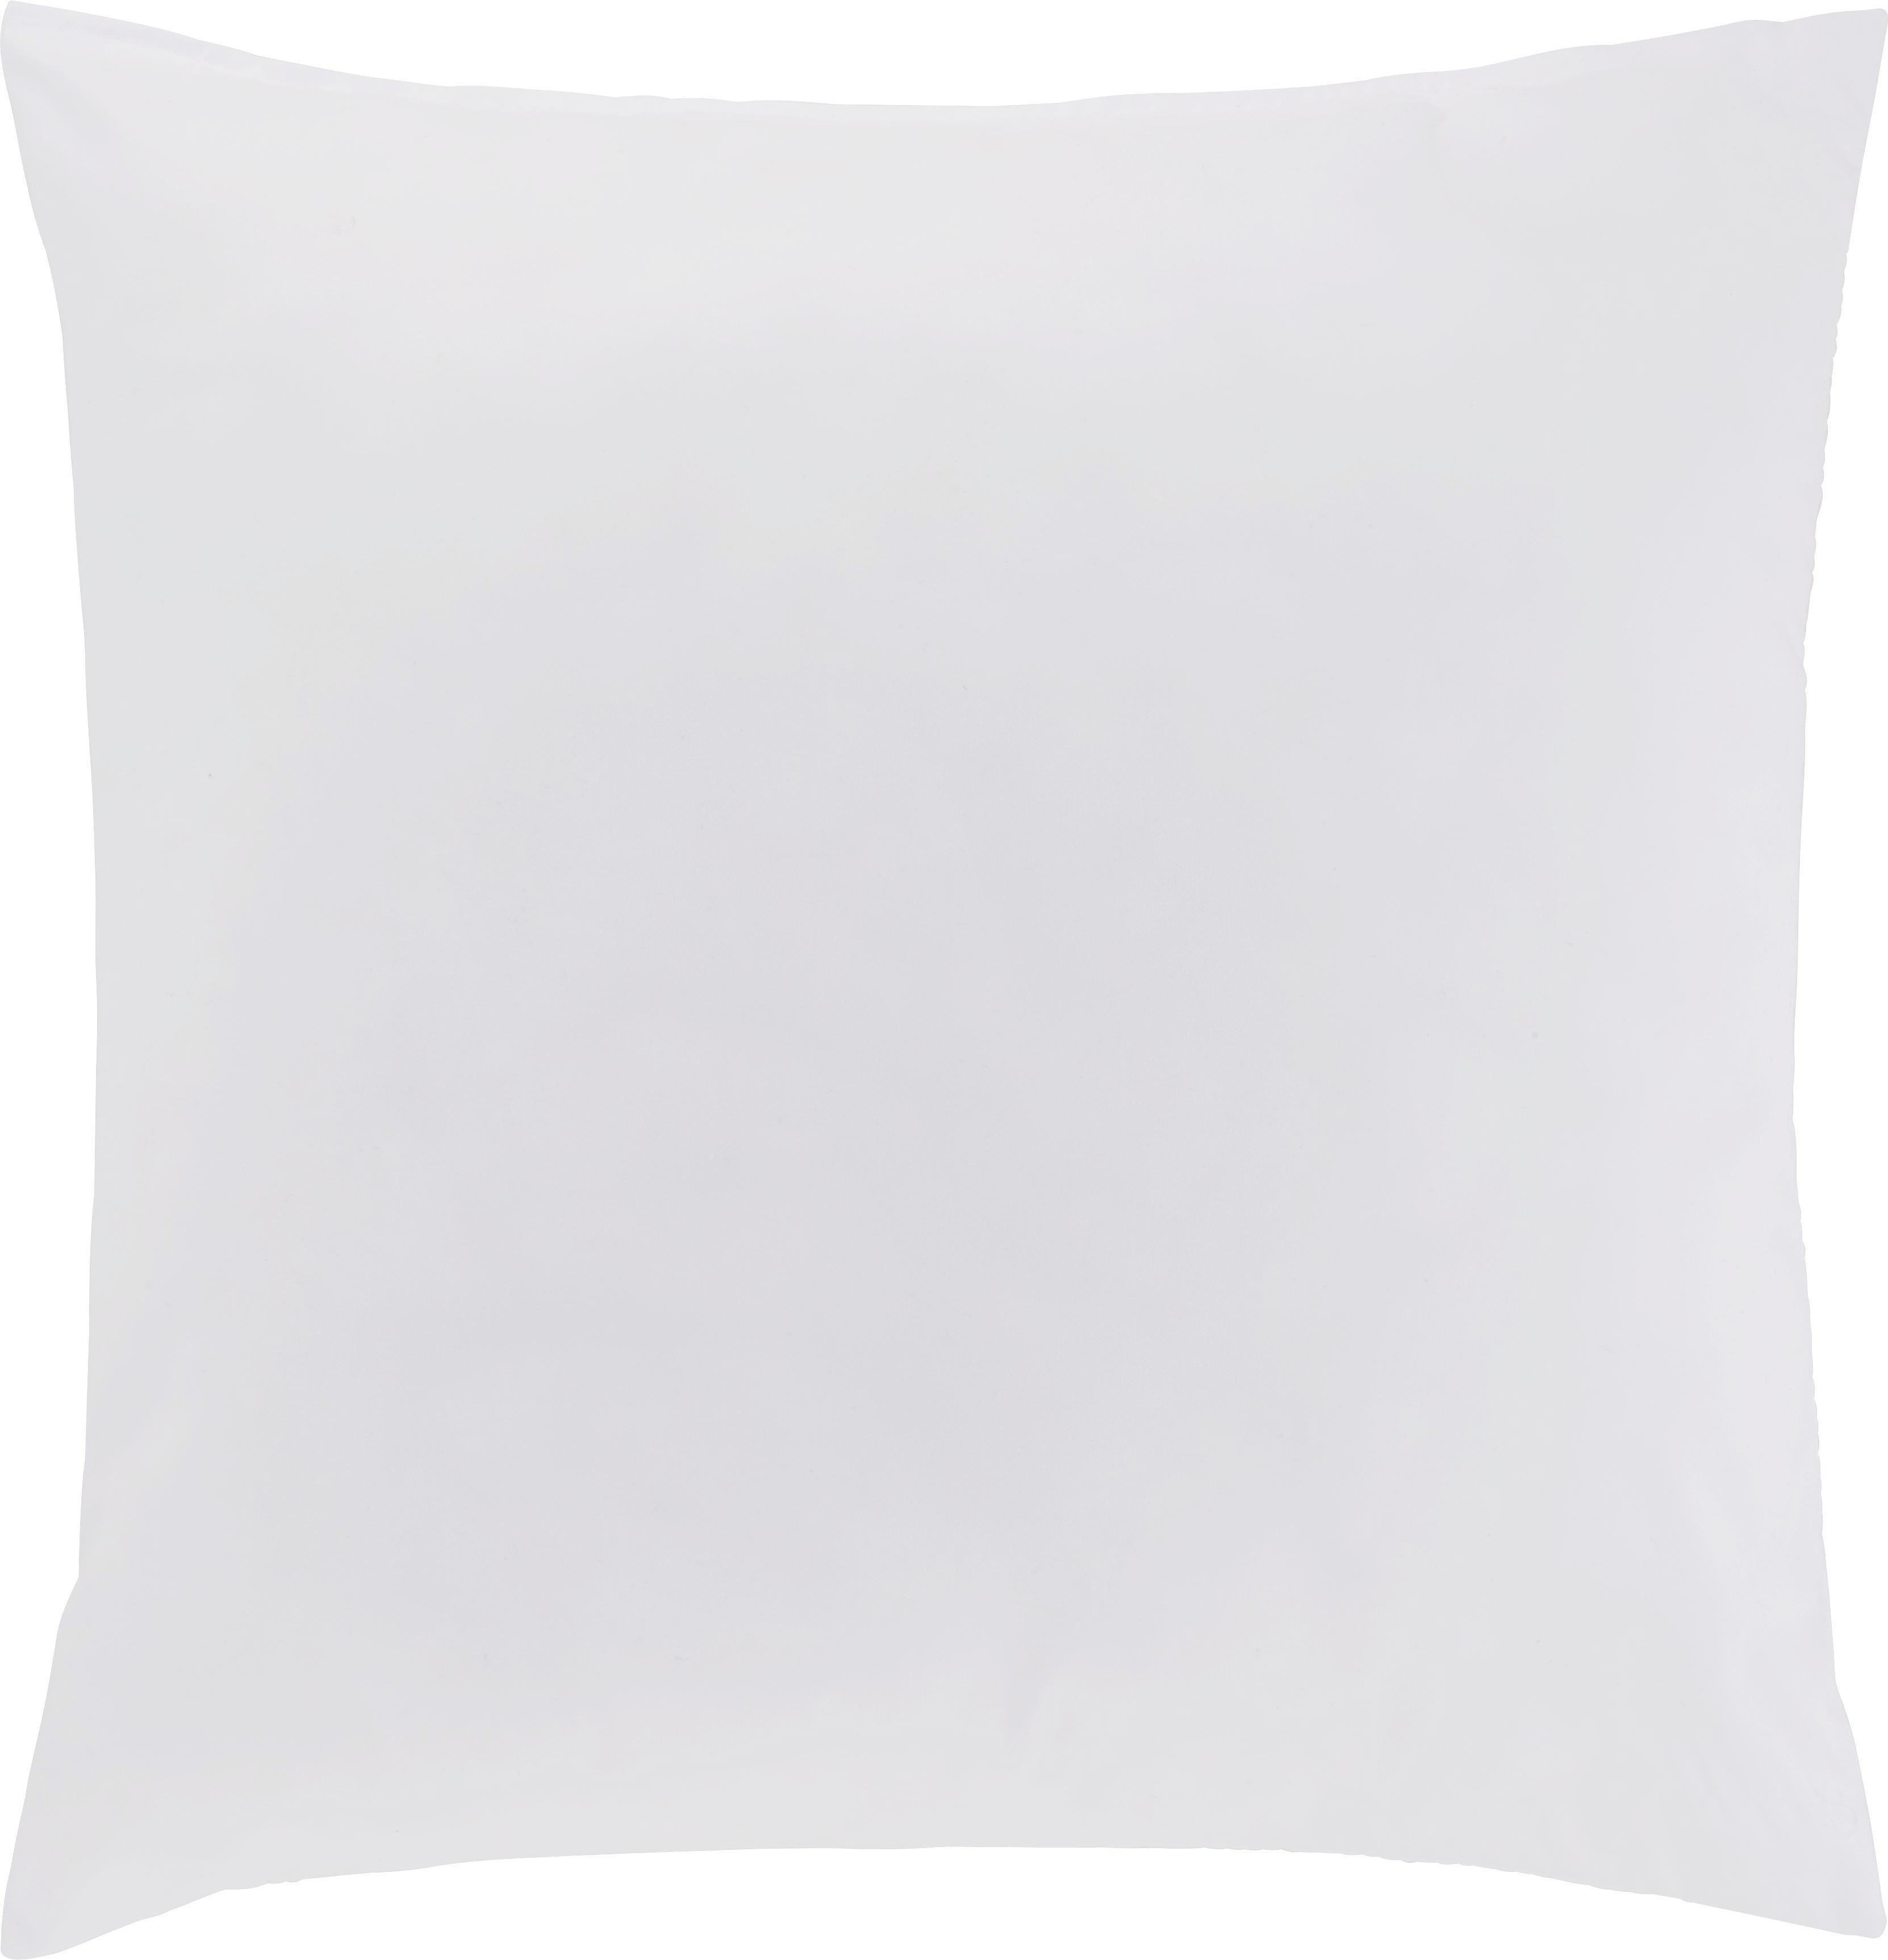 Kissen Ani in Weiß, ca. 50x50cm - Weiß, Textil (50/50cm) - MÖMAX modern living